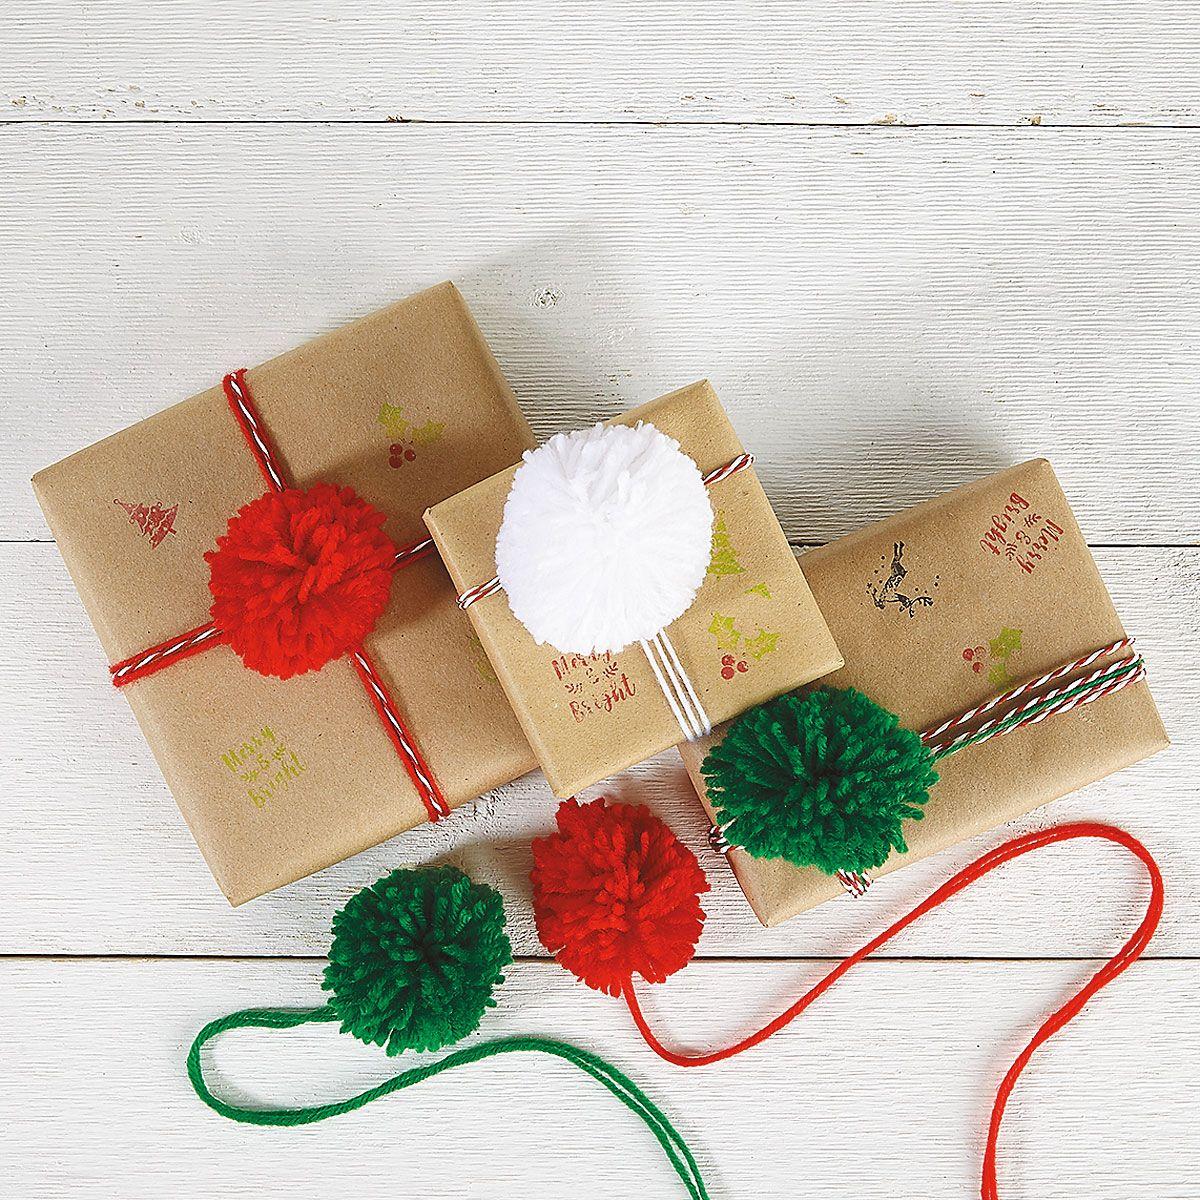 Christmas Pom-Pom Package Toppers